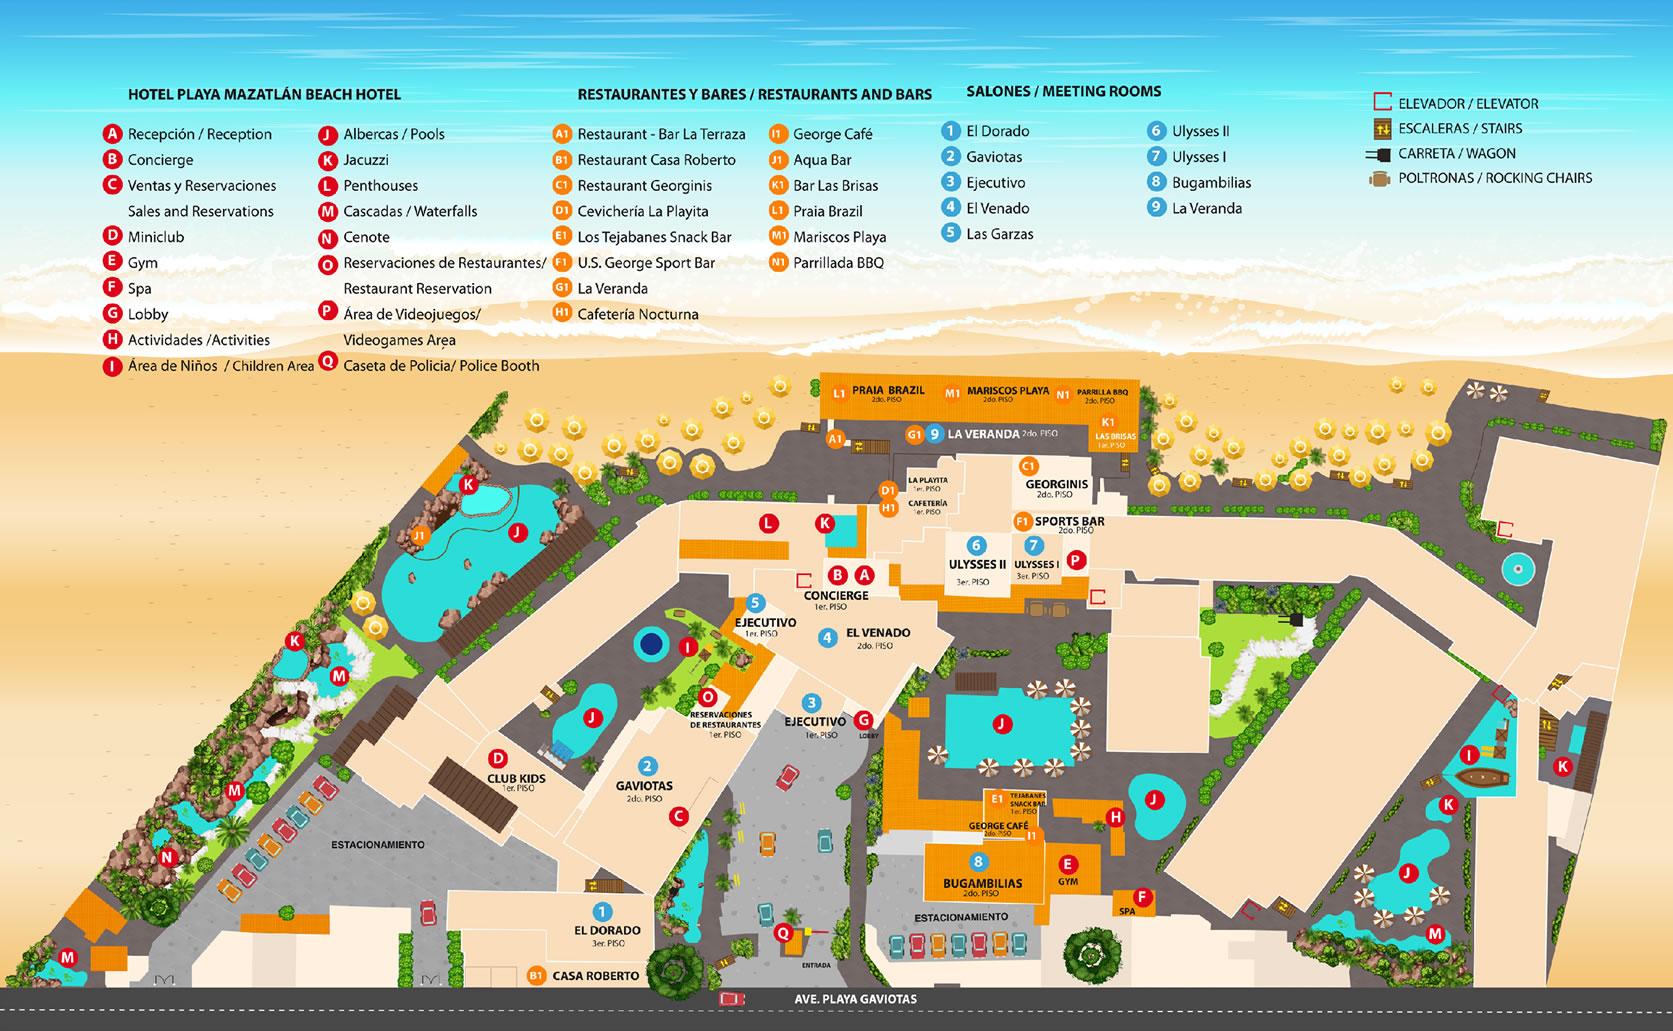 Mapa de Hotel Playa Mazatlán